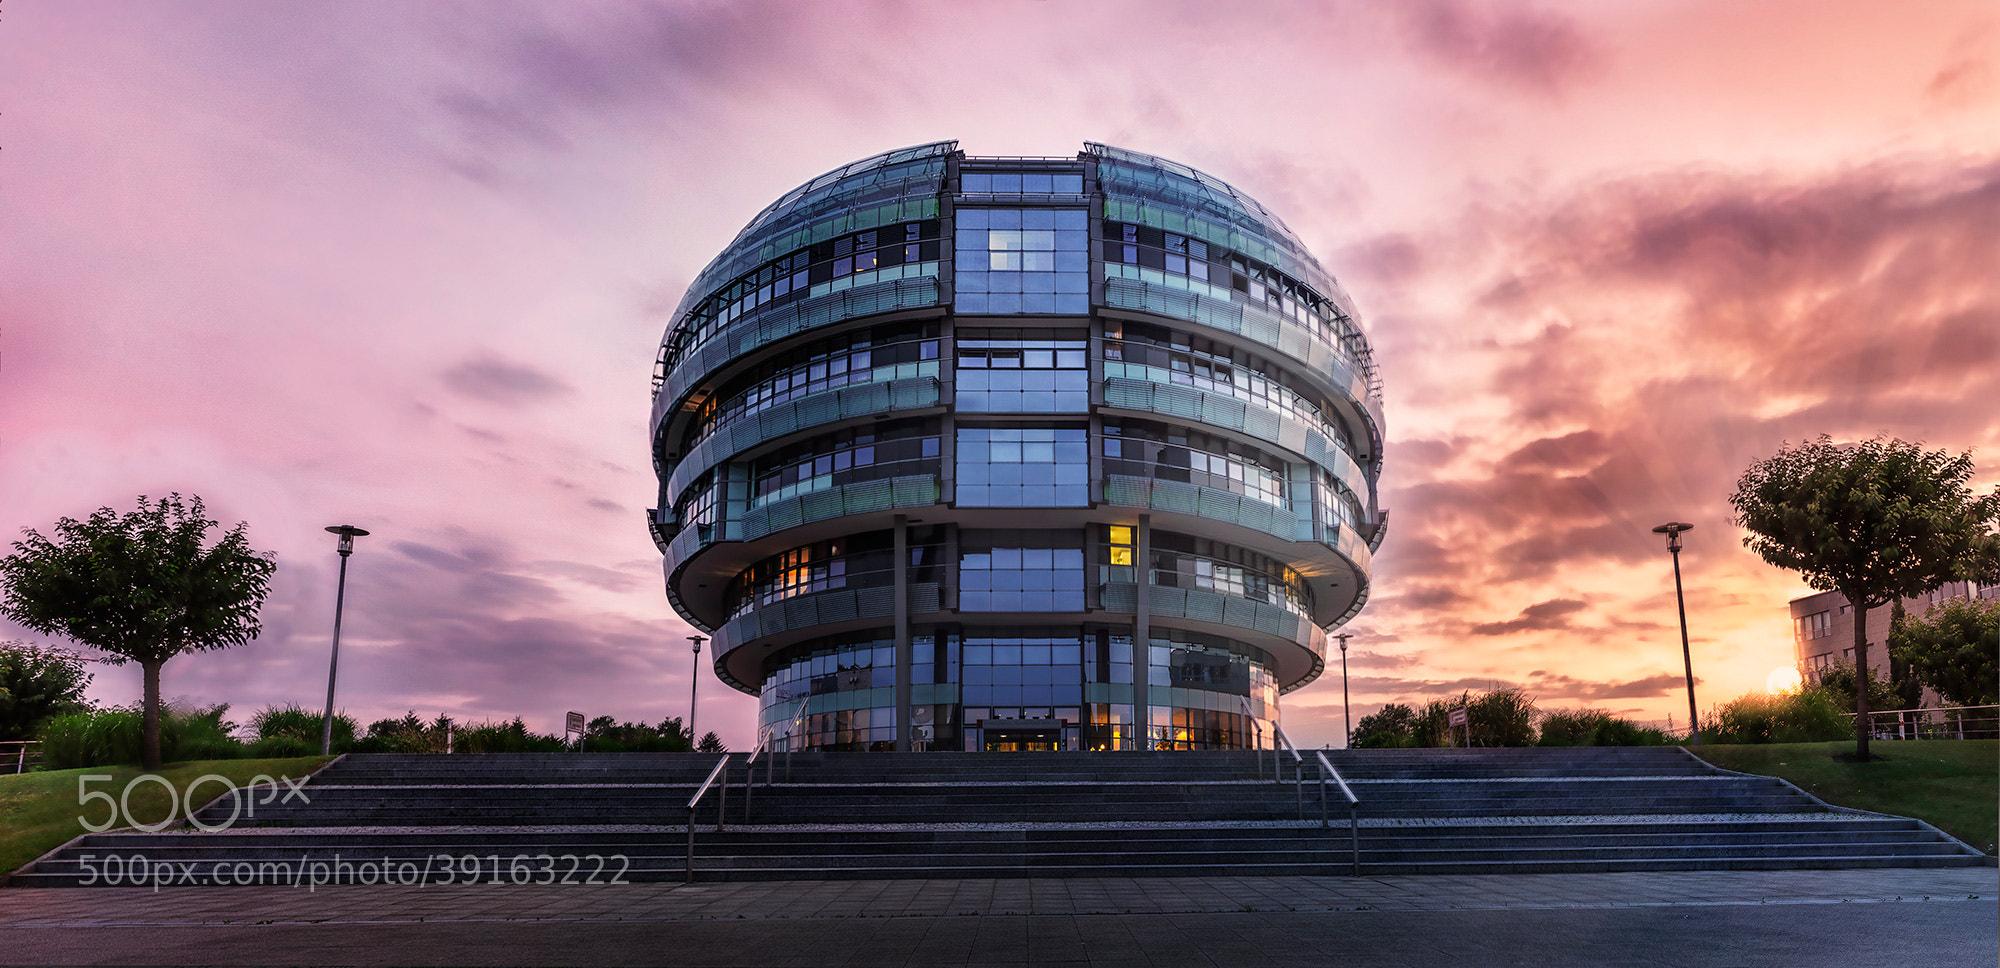 Photograph International neuroscience institute by Frank Klix on 500px